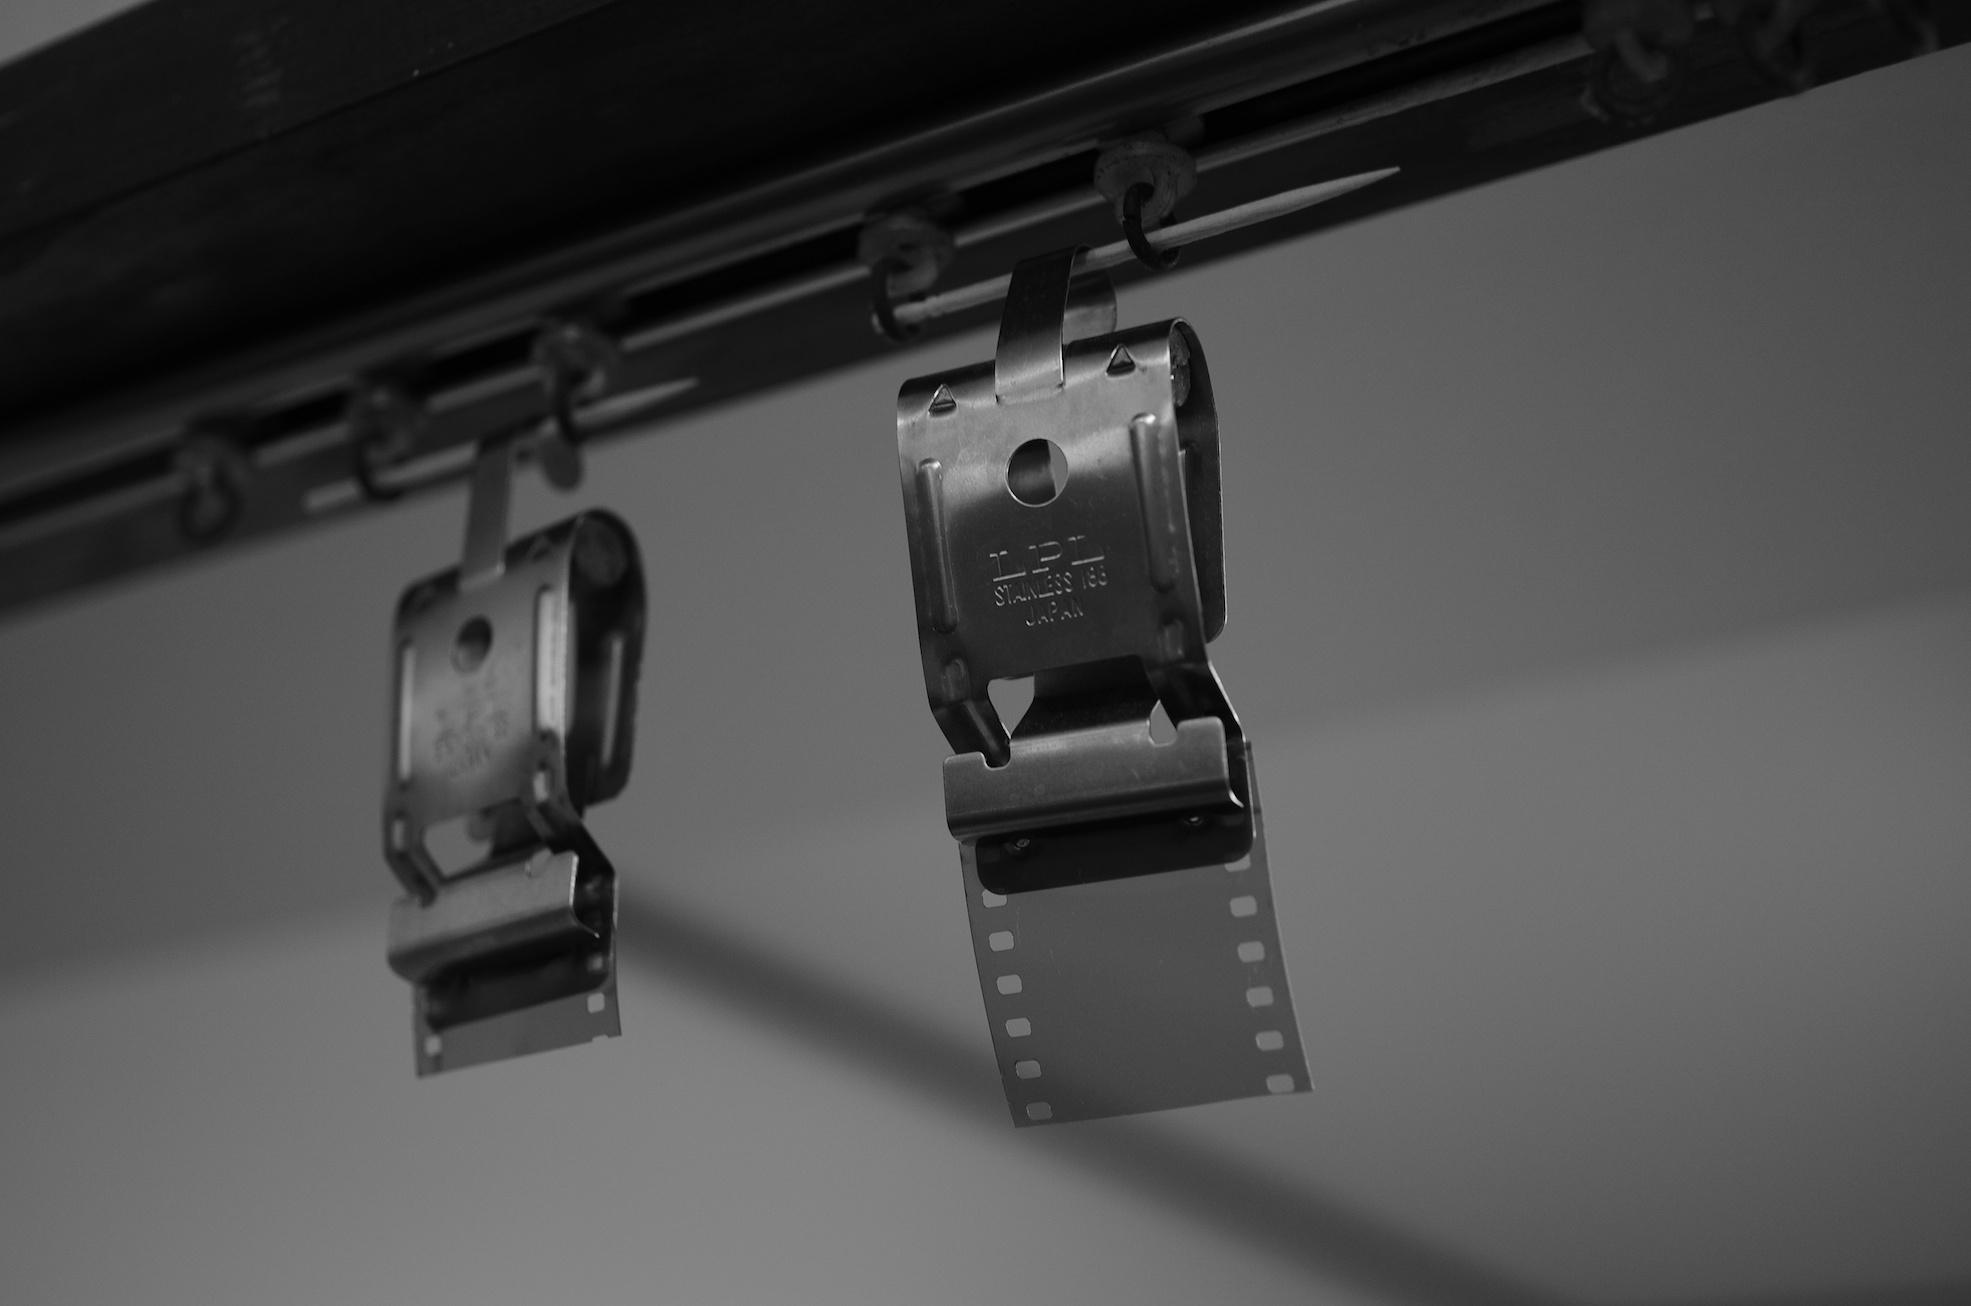 PENTAX K-5 smc PENTAX-DA 35mm F2.8 Macro Limited ISO400 f2.8 1/25